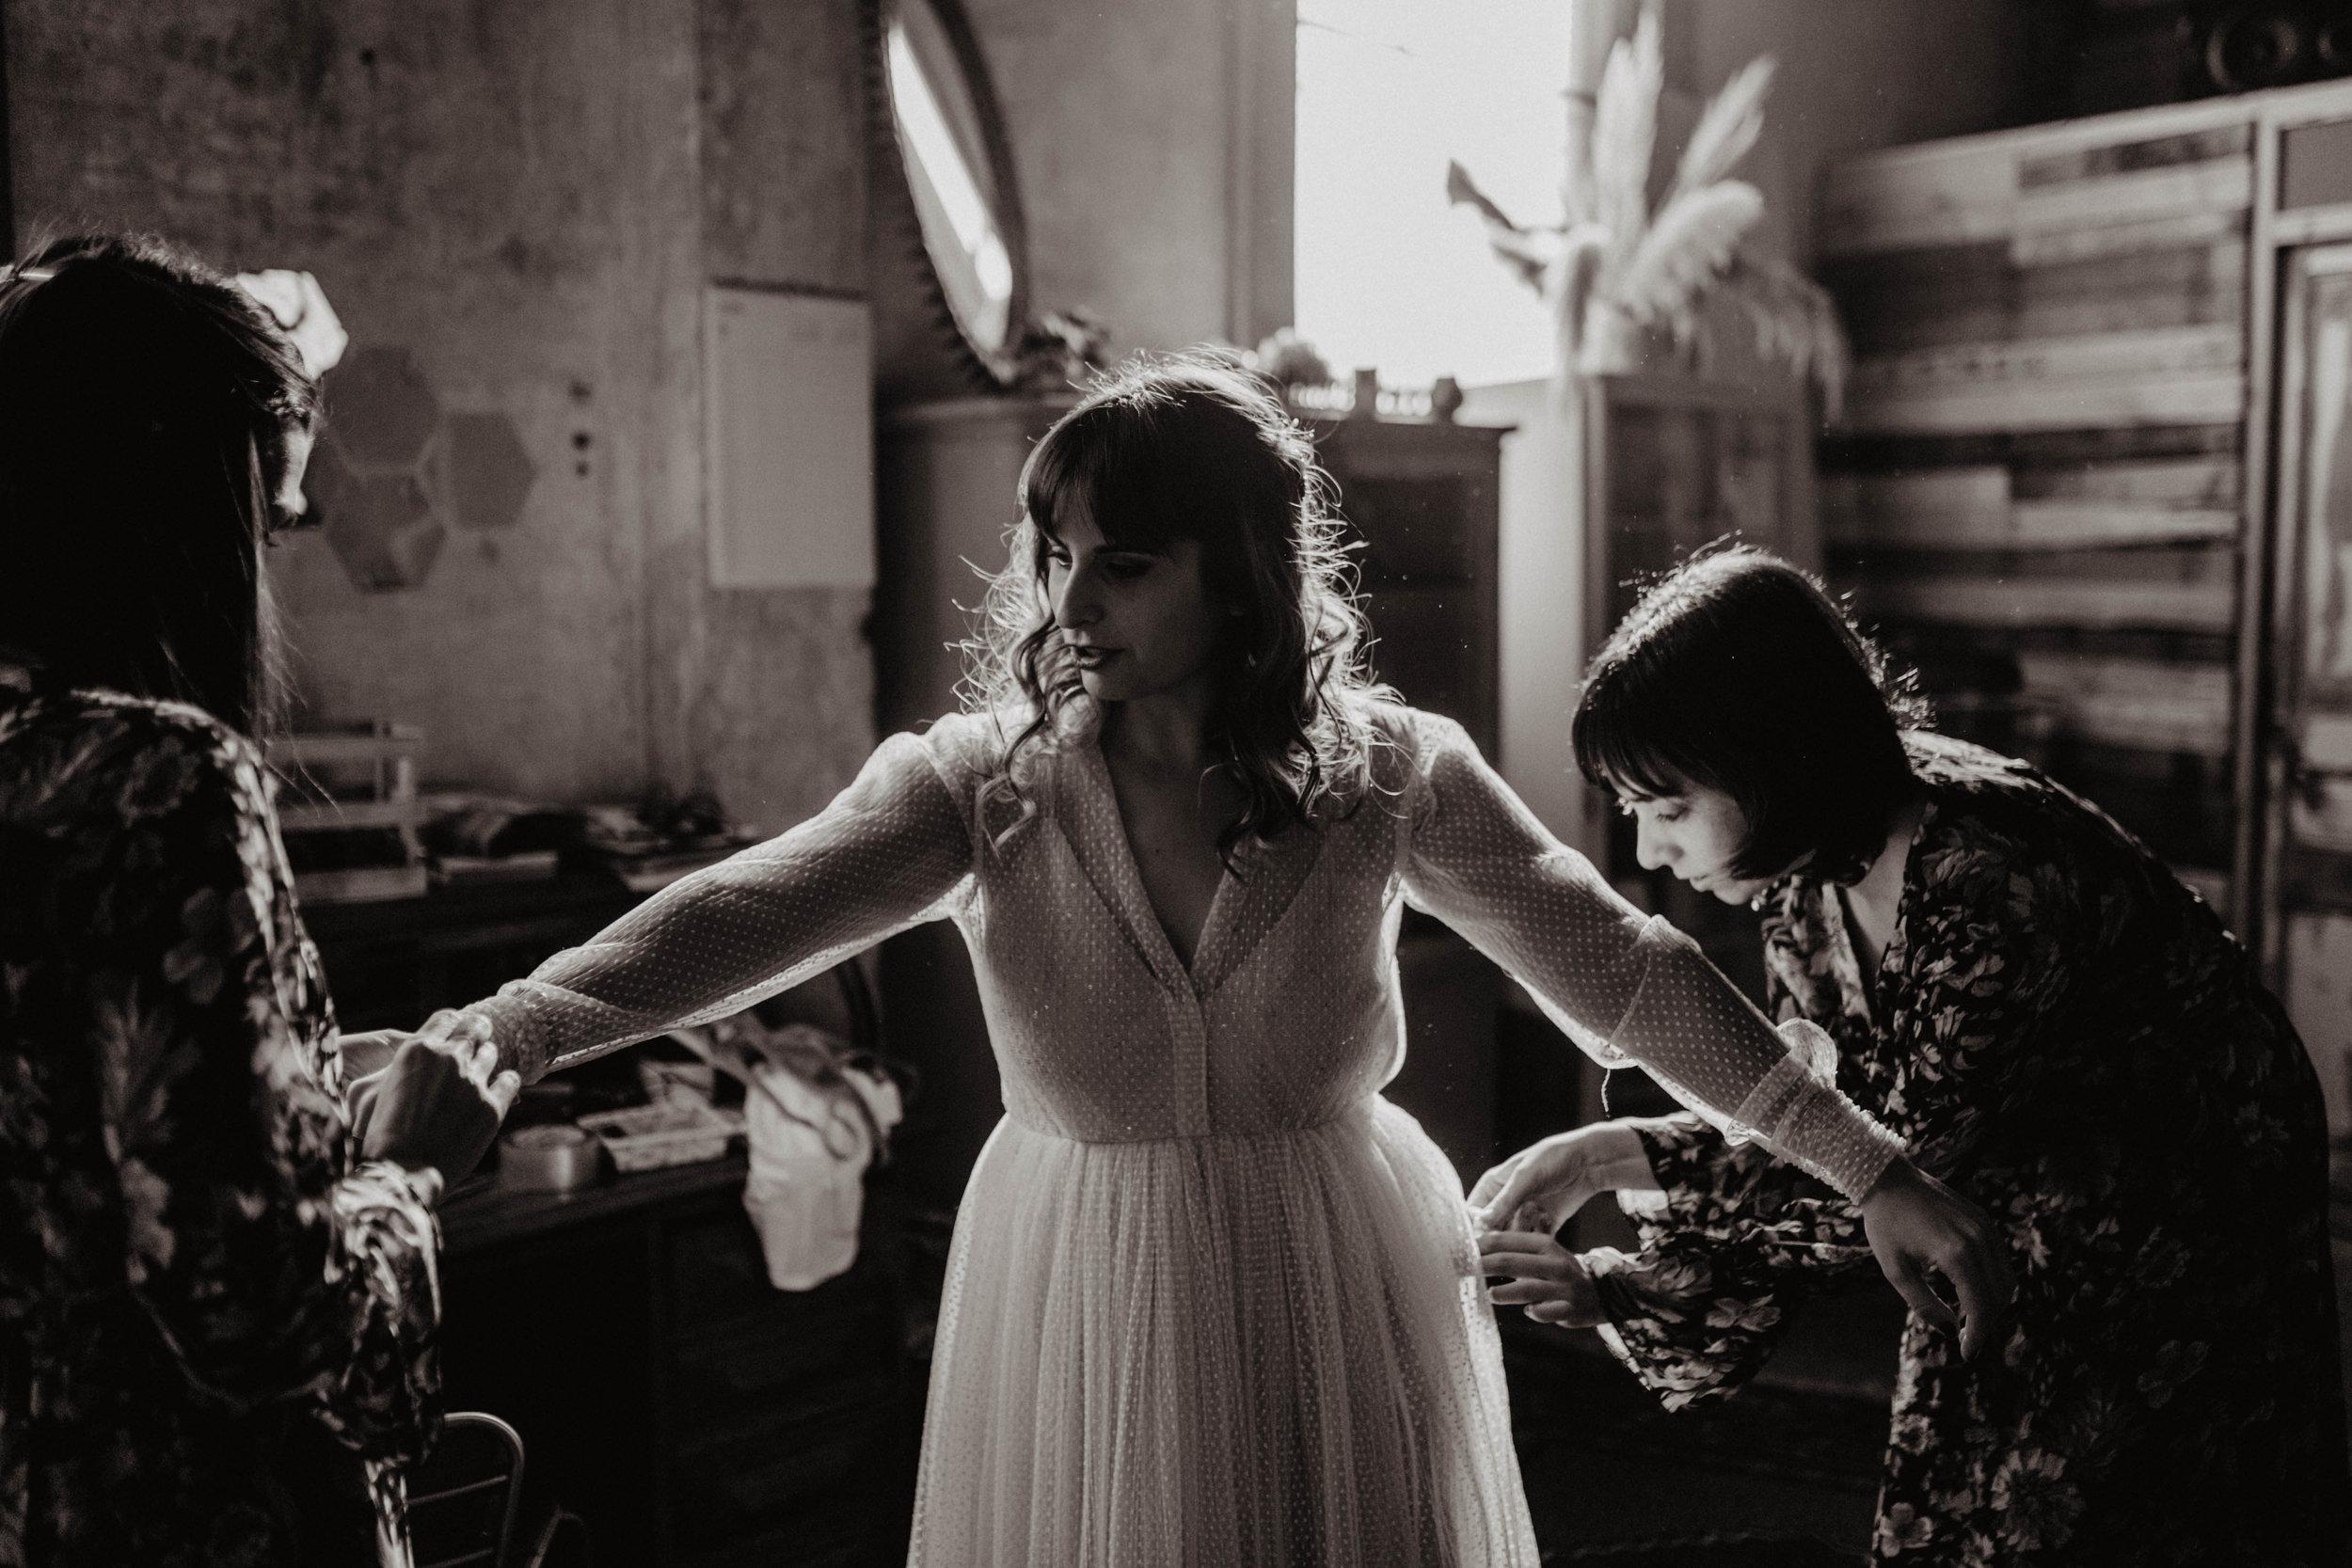 thenortherngirlphotography-photography-weddingphotography-couple-bodasconestilo-bodasenbarcelona-martadavid-171.jpg